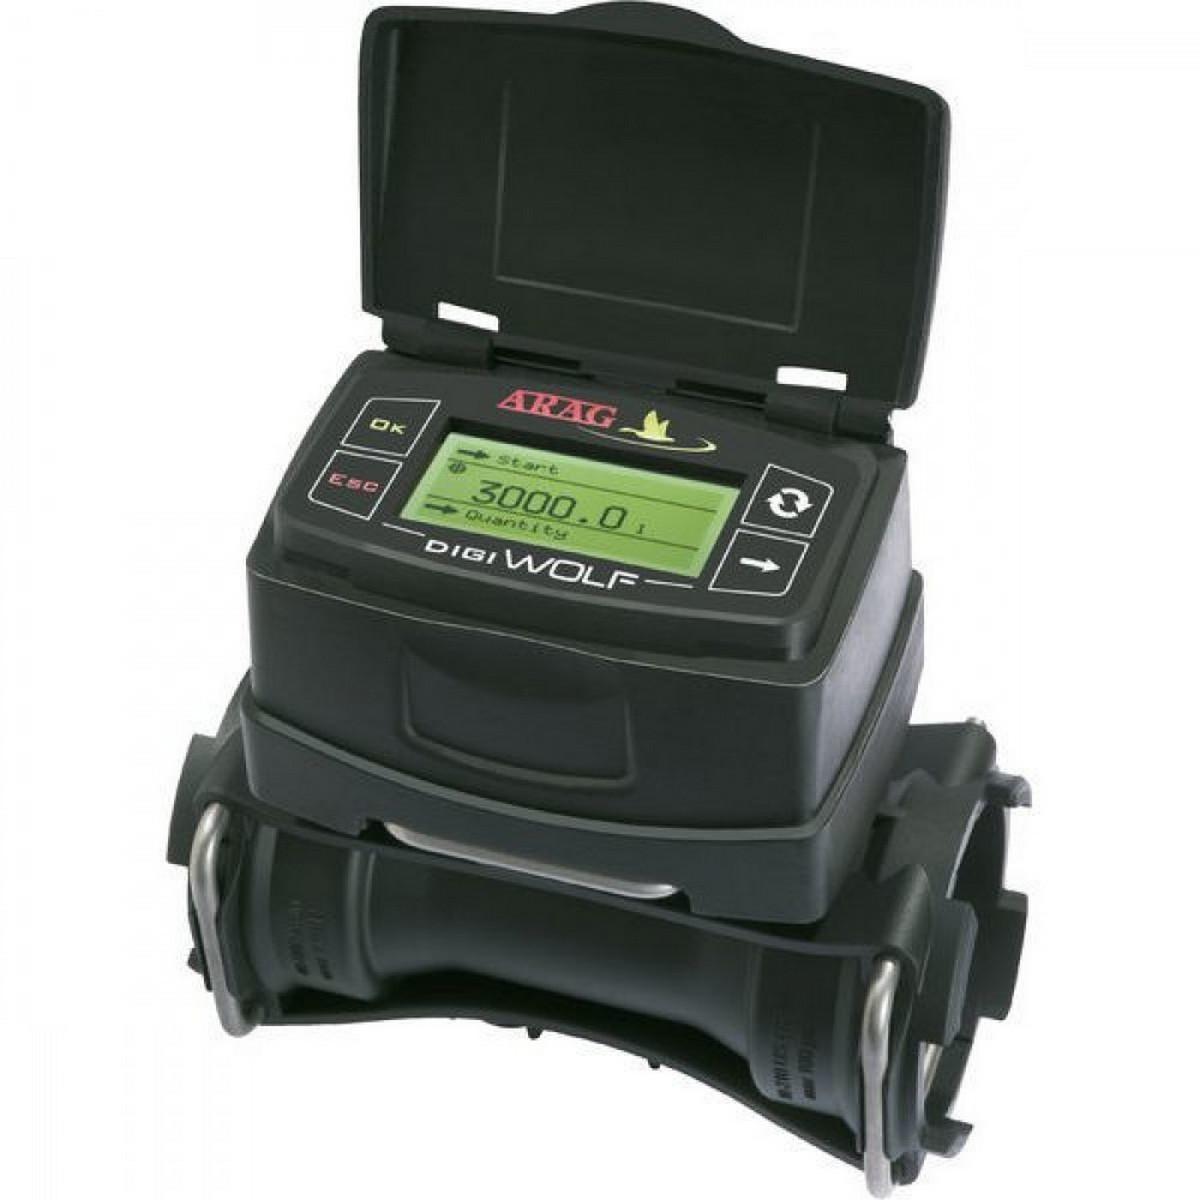 digitalni merač za vodu